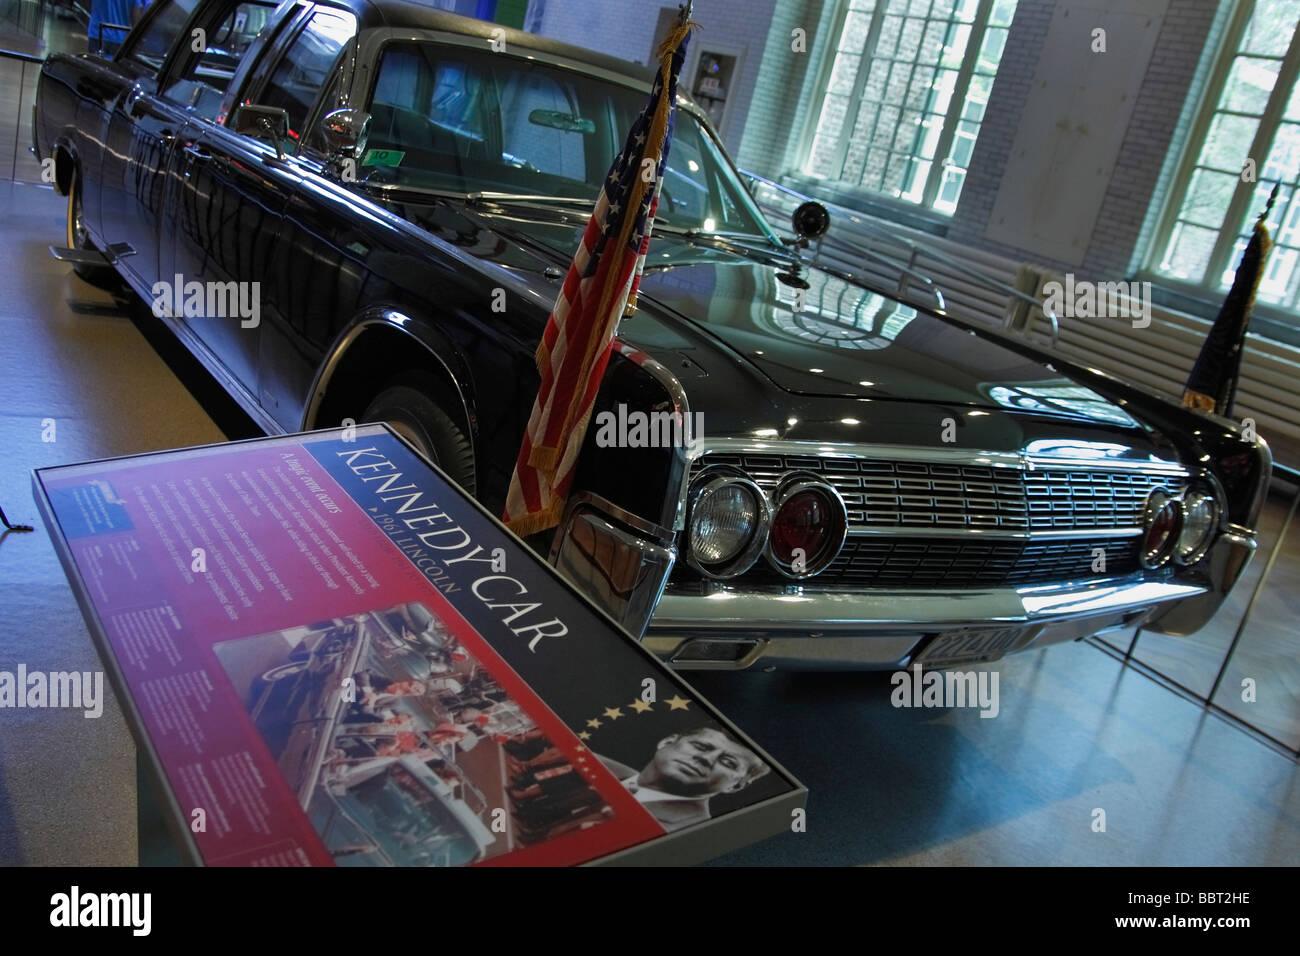 ford president car. 1961 lincoln antique ford henry museum historic john f kennedy old president presidential car n